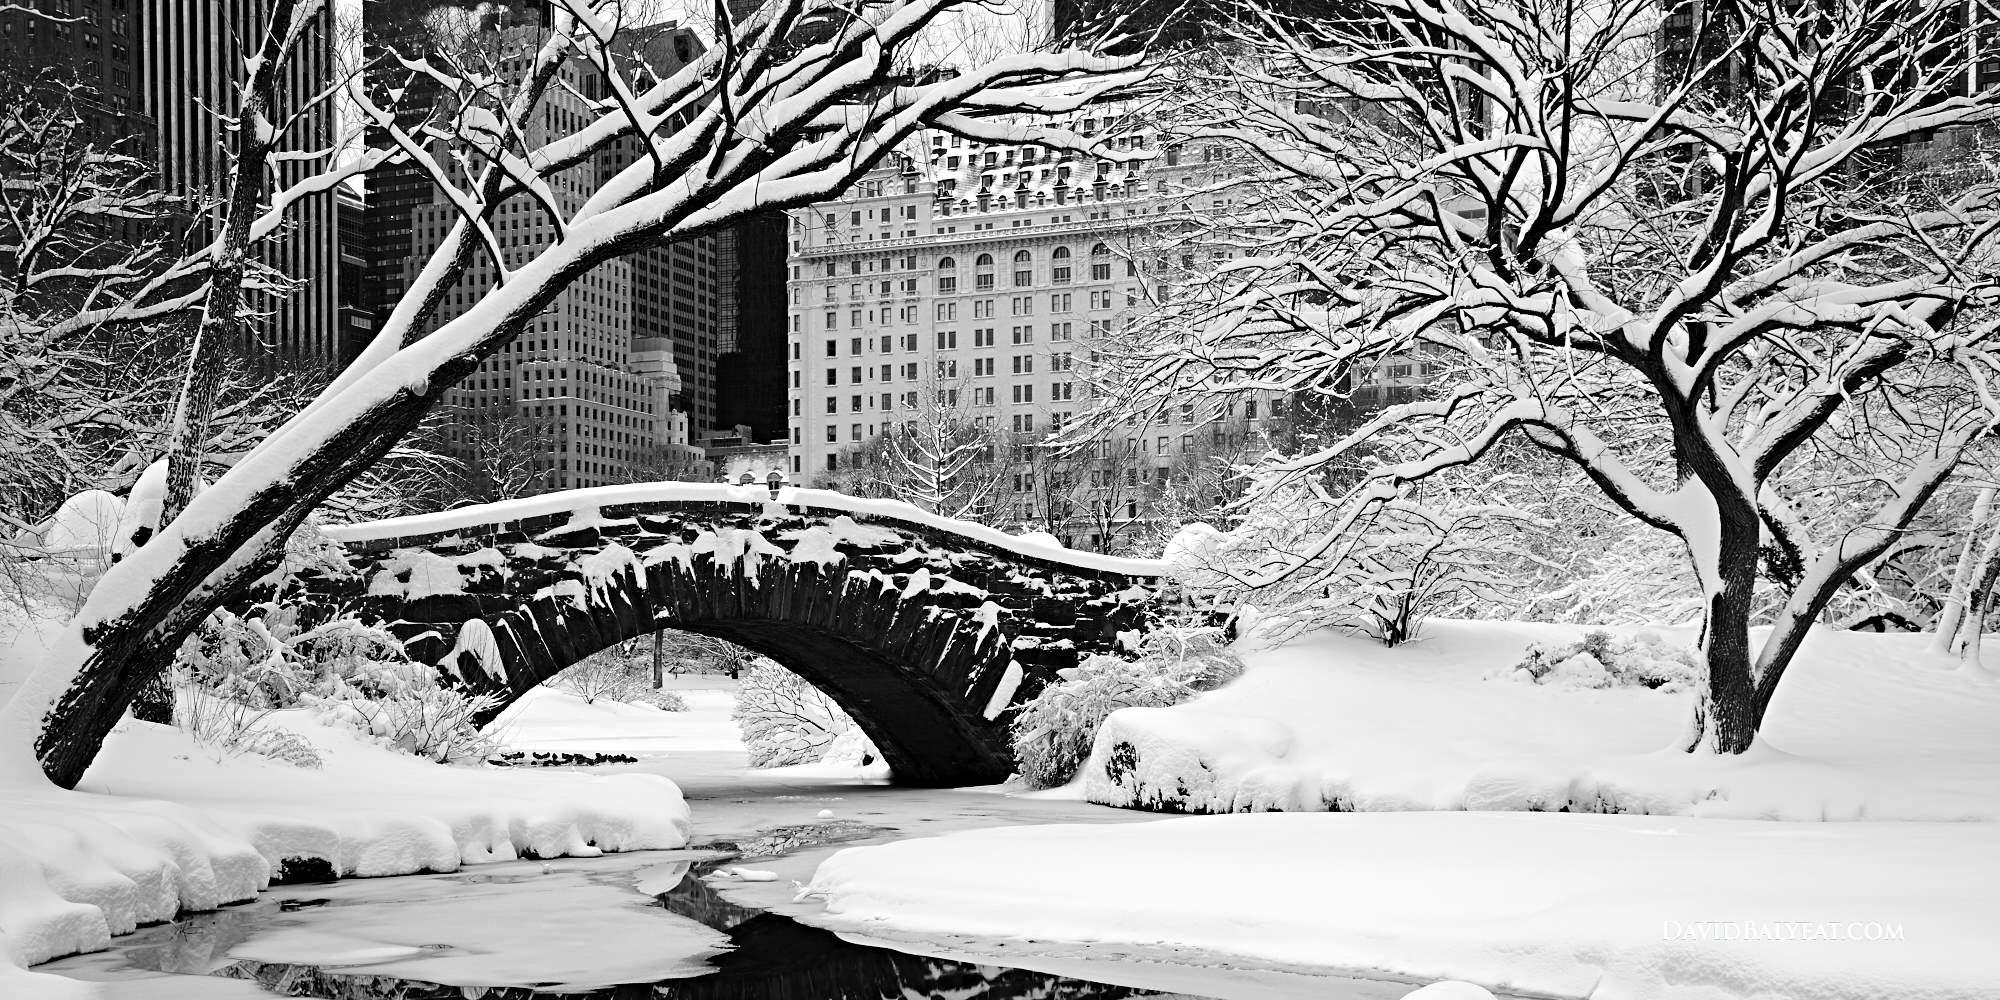 Seattle Washington Fall Skyline Wallpaper Winter Paradise Central Park David Balyeat Photography